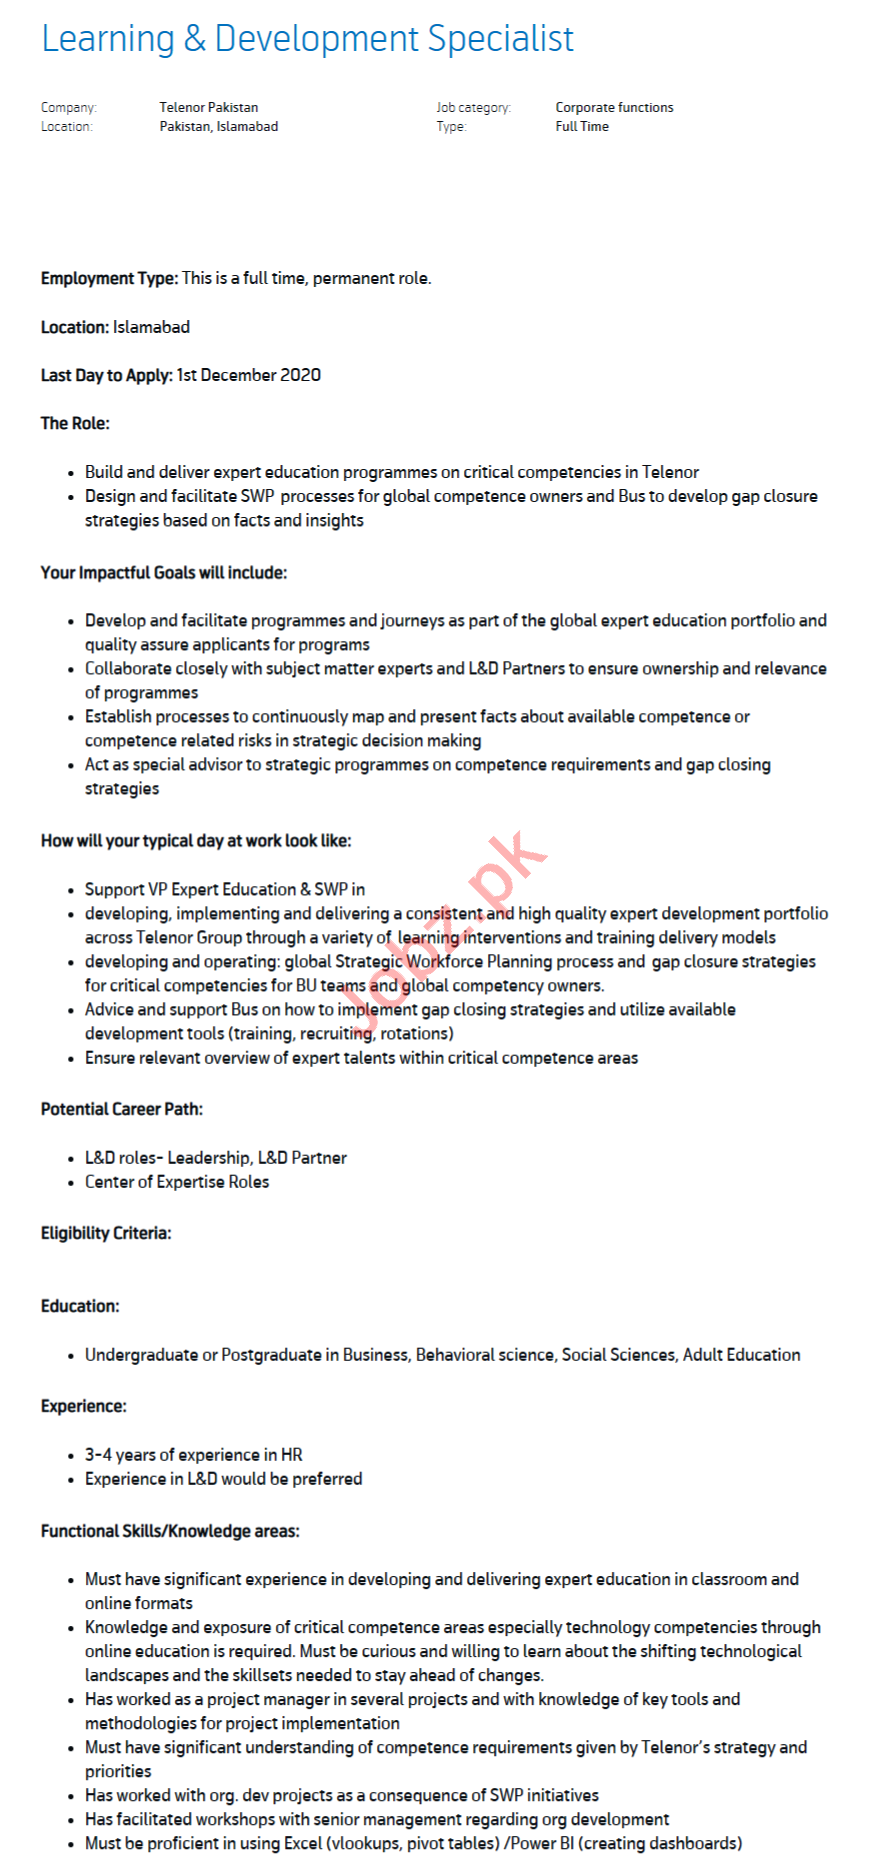 Learning & Development Specialist Jobs 2020 in Islamabad